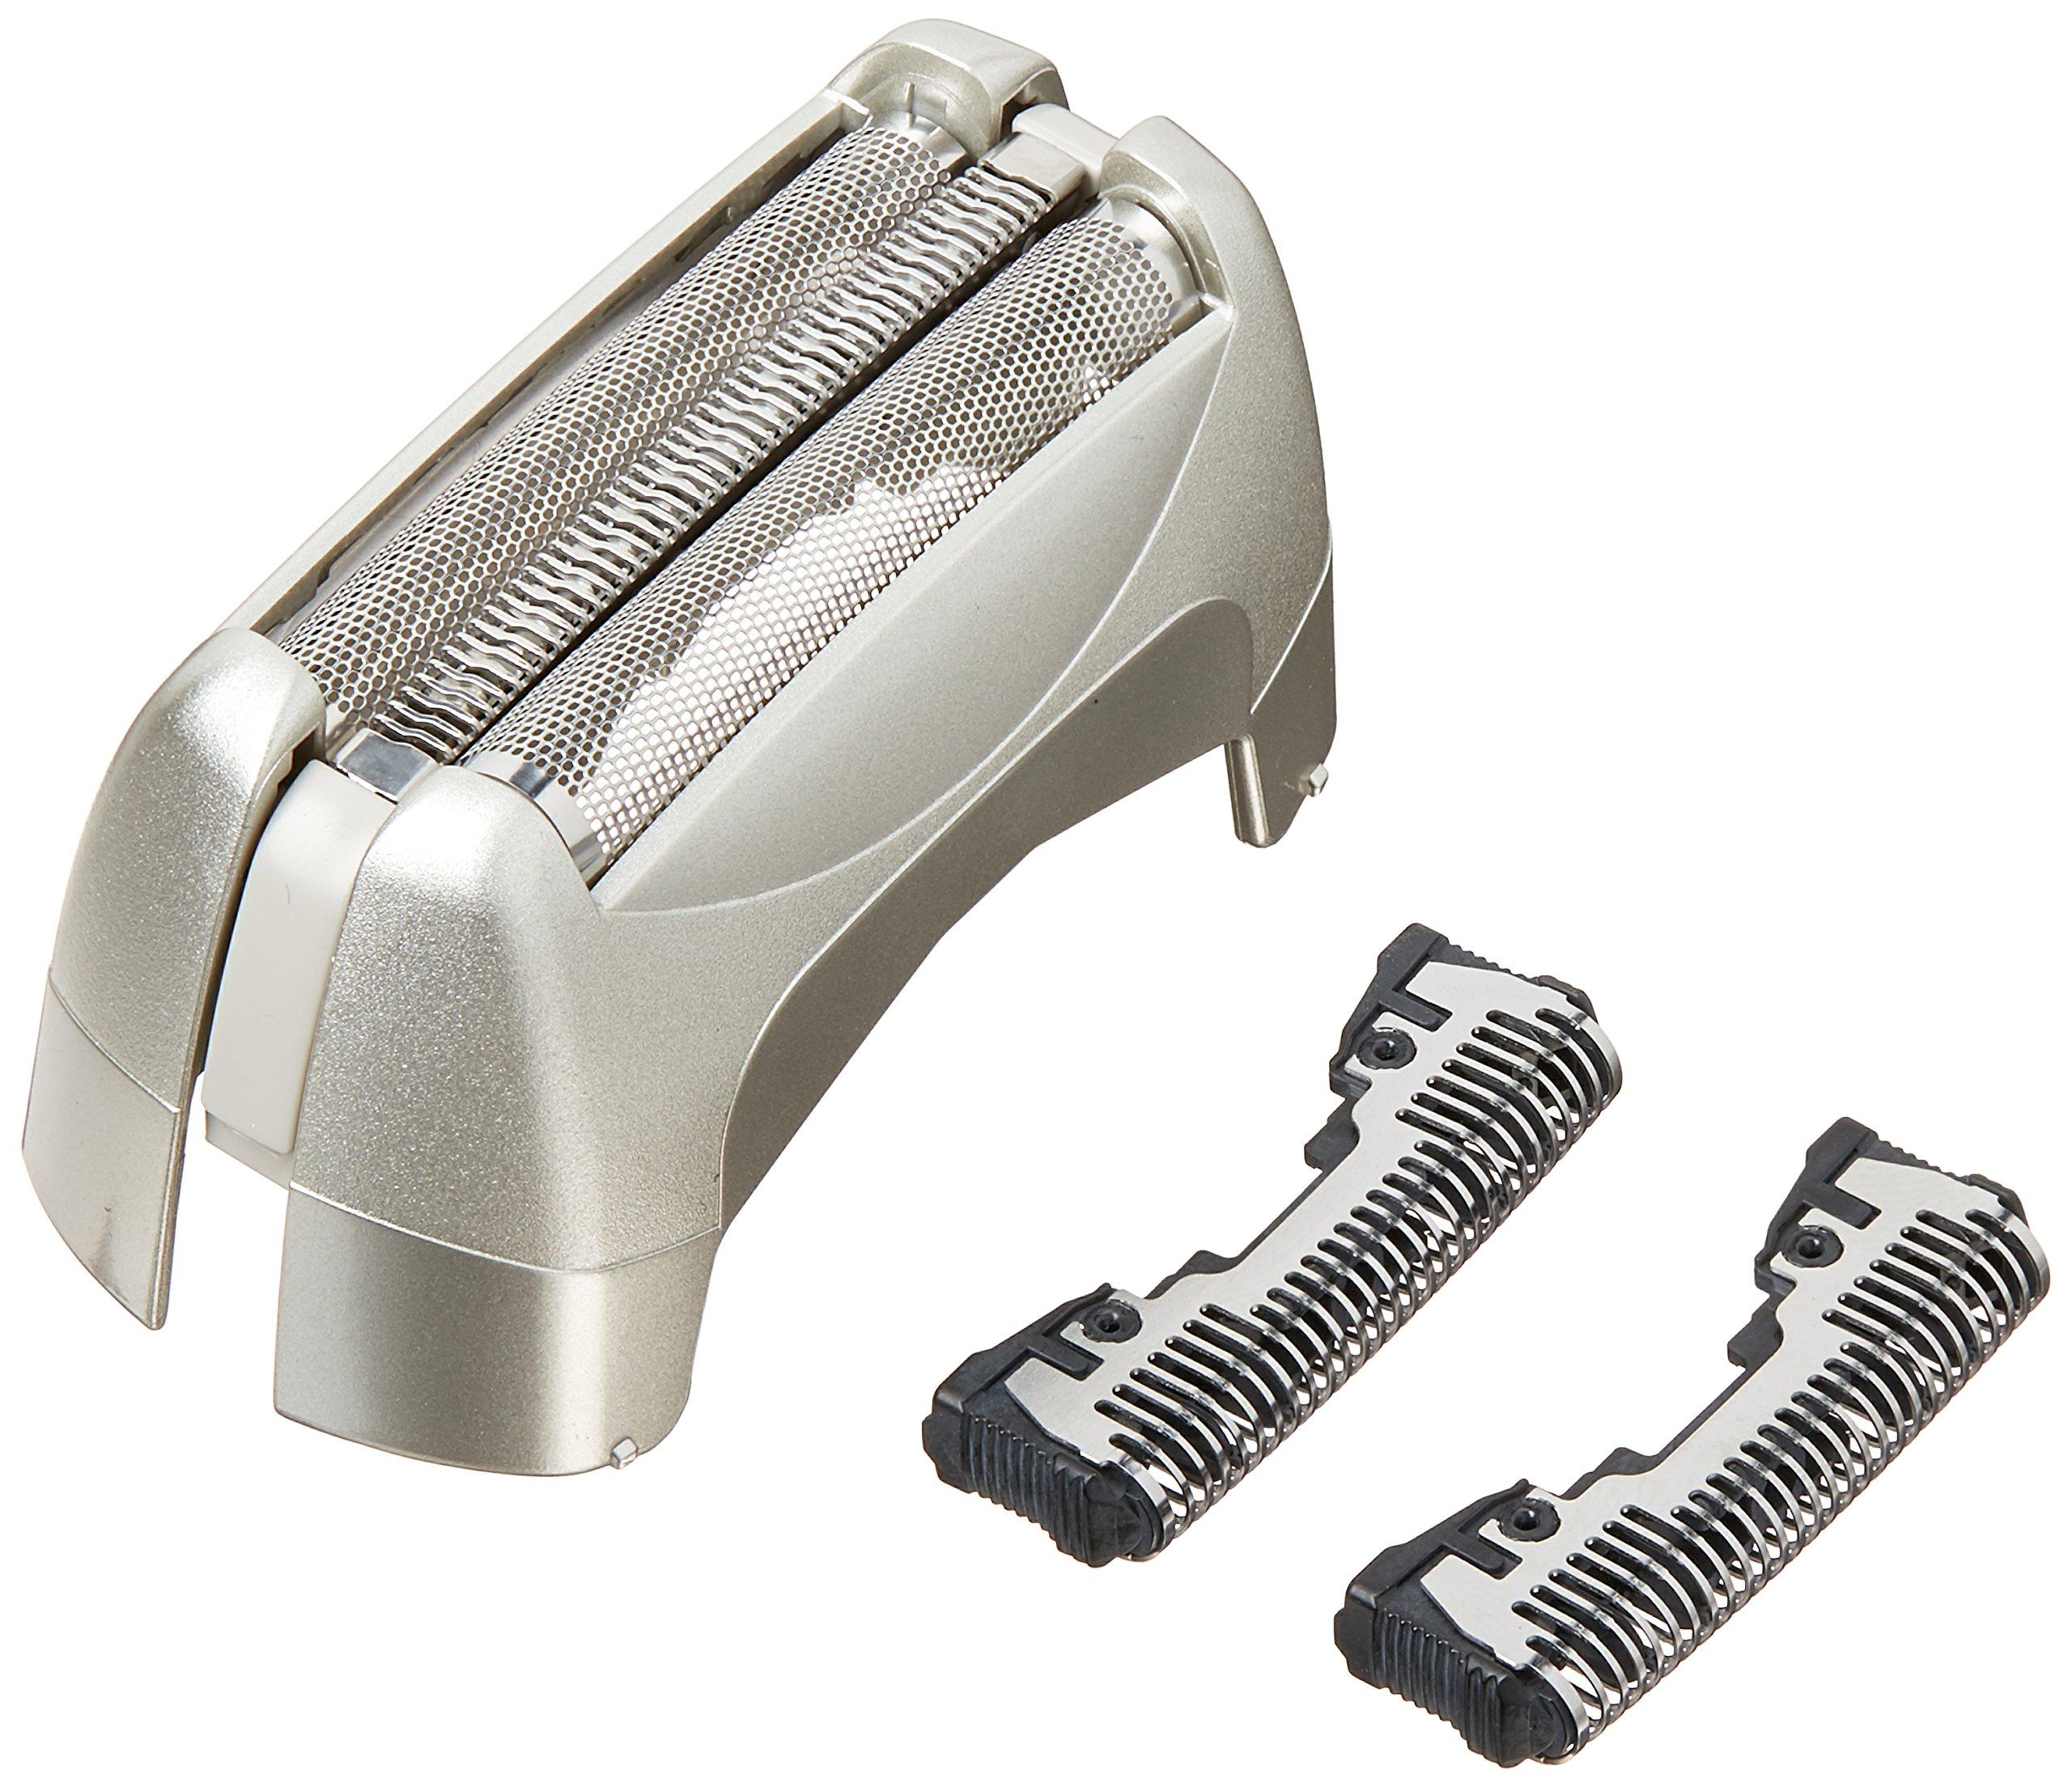 Panasonic WES9014PC Blade